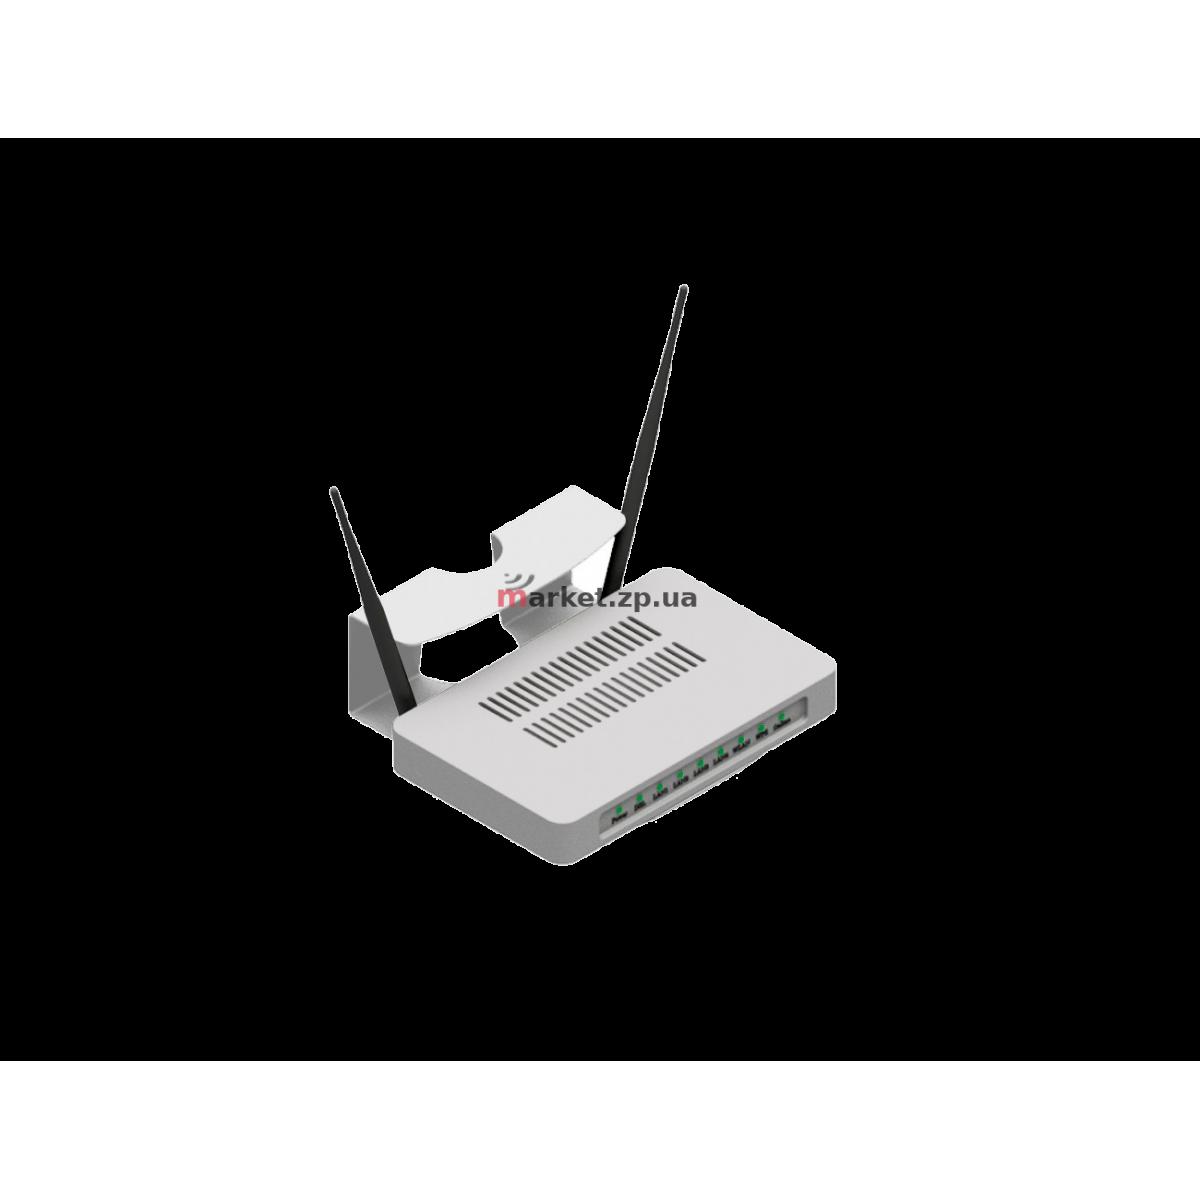 Полка для роутера и ТВ приставки RS100 (White)